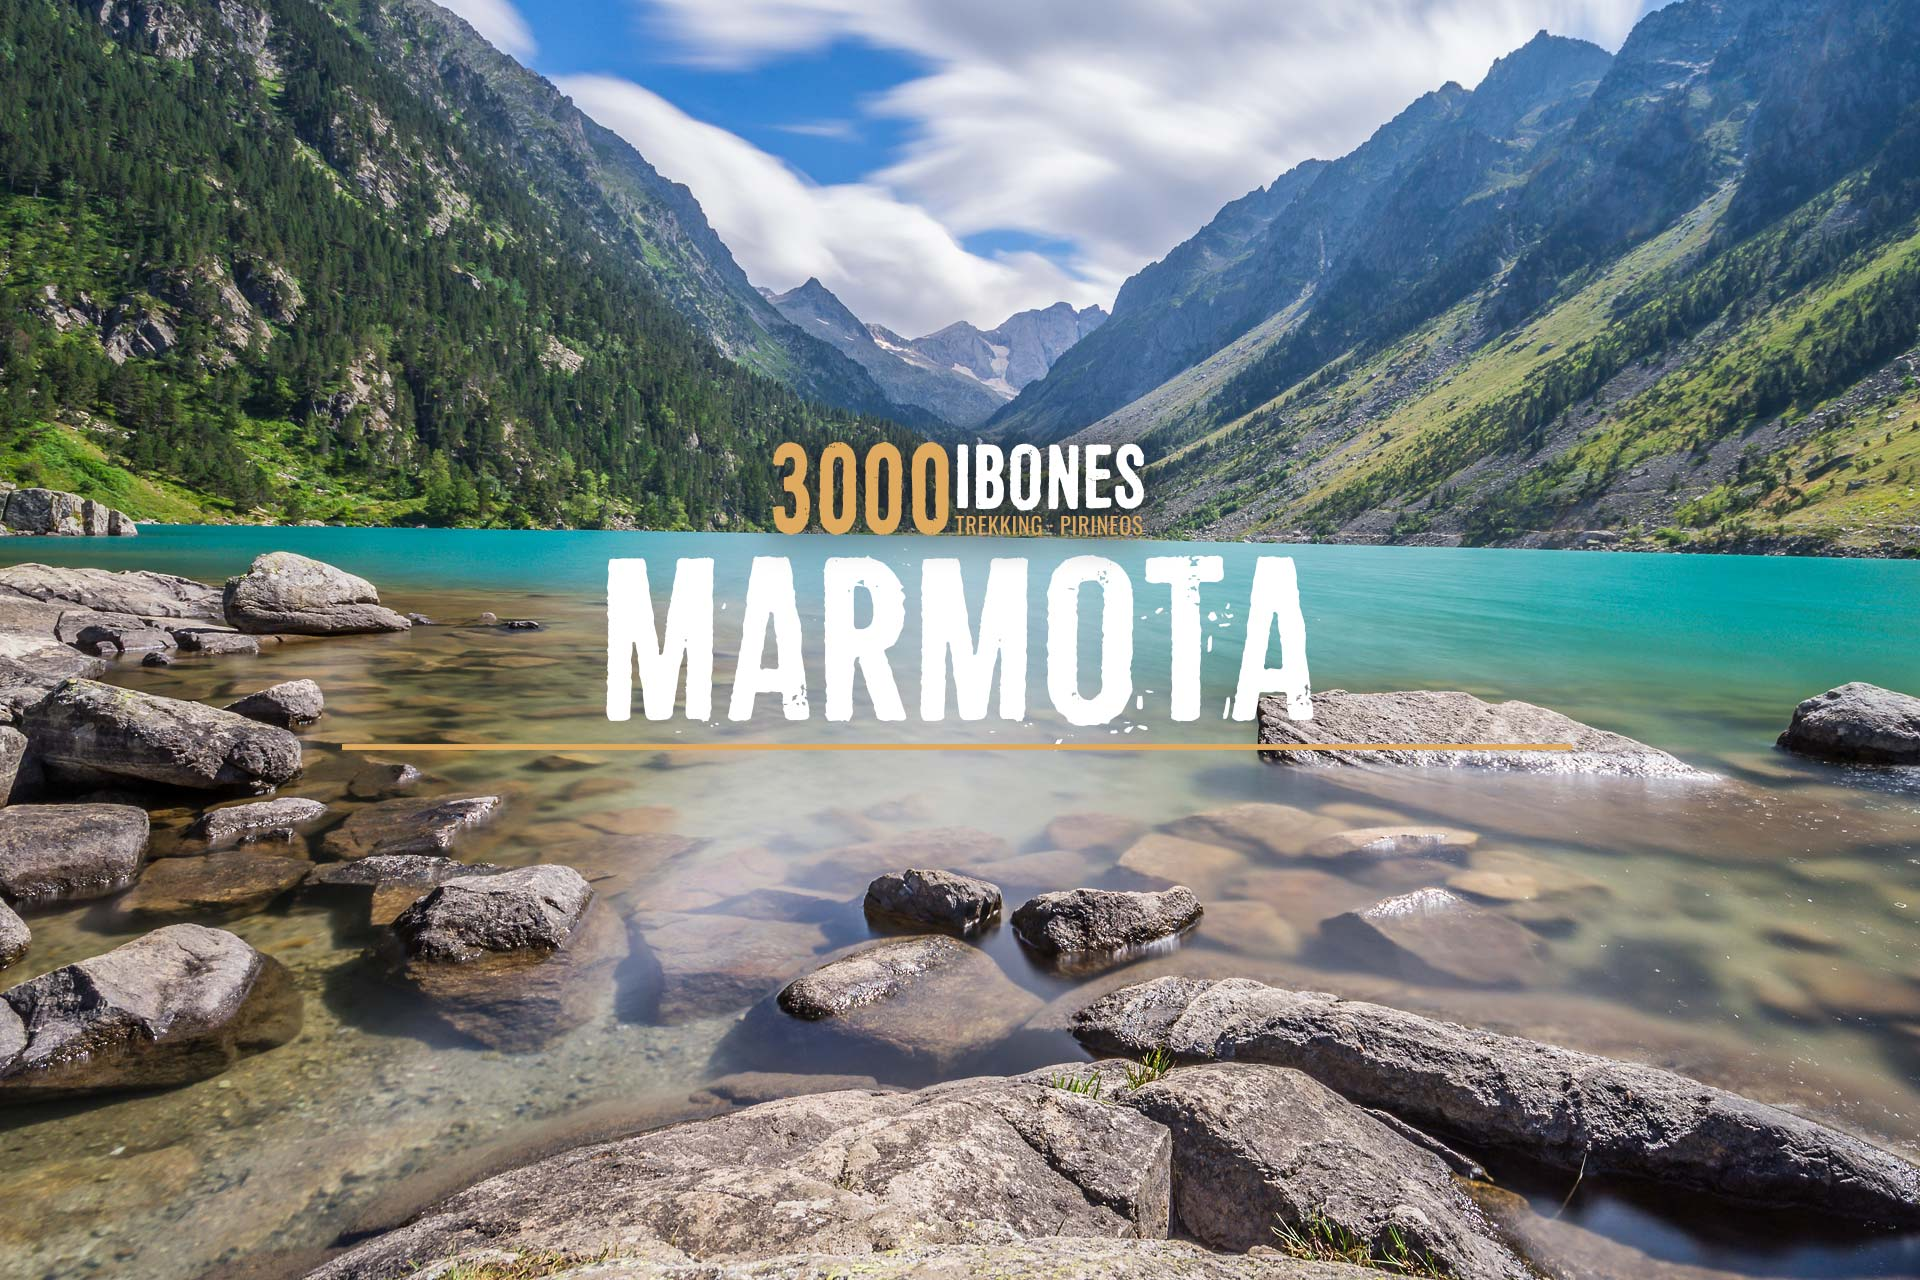 3000IBONES MARMOTA Ruta circular 4 dias Pirineos